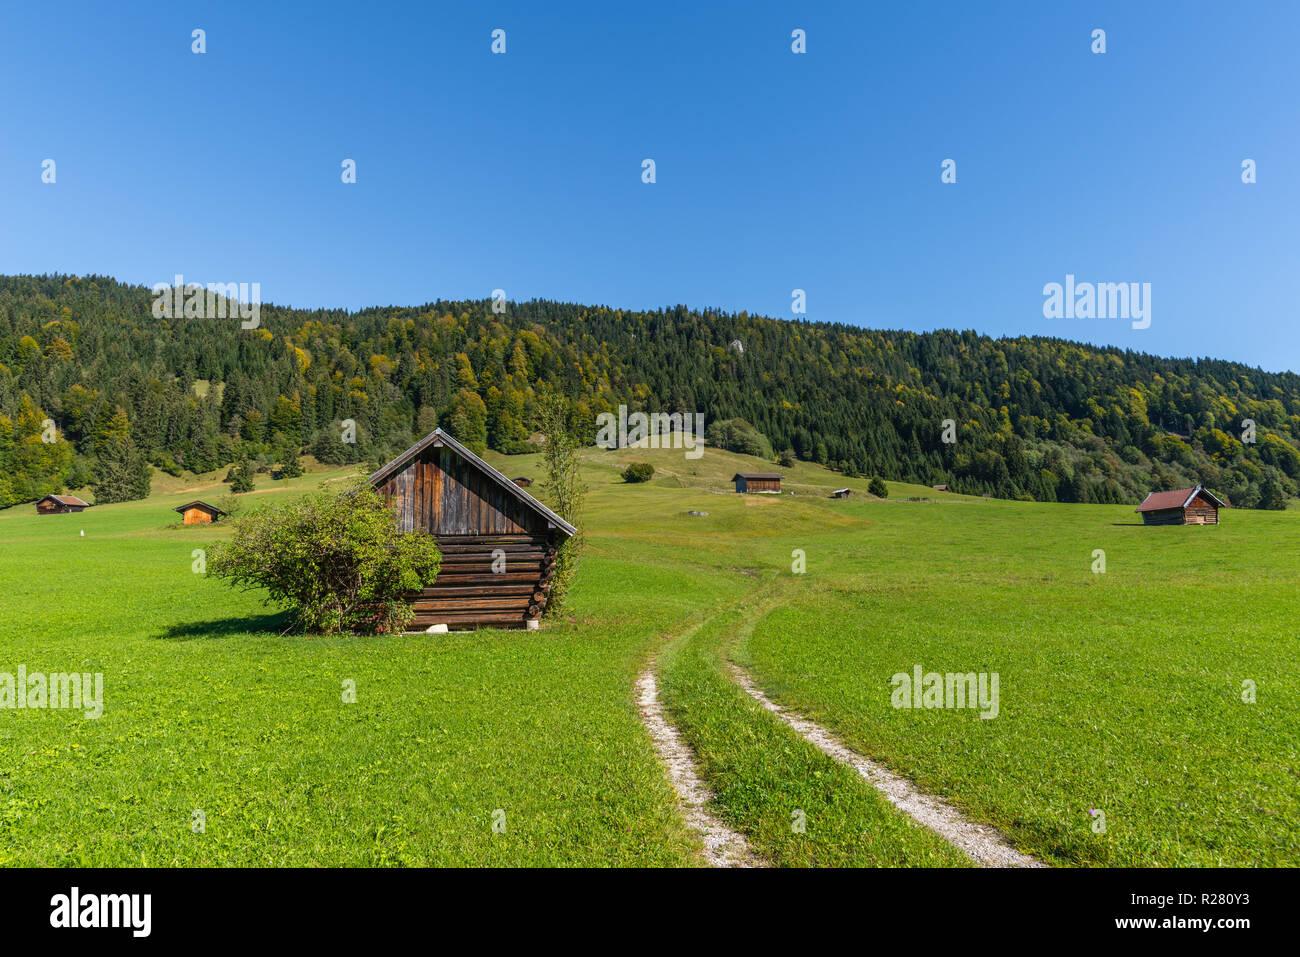 Gerold, Krün, Upper Bavaria, Bavaria, South Germany, Europe - Stock Image